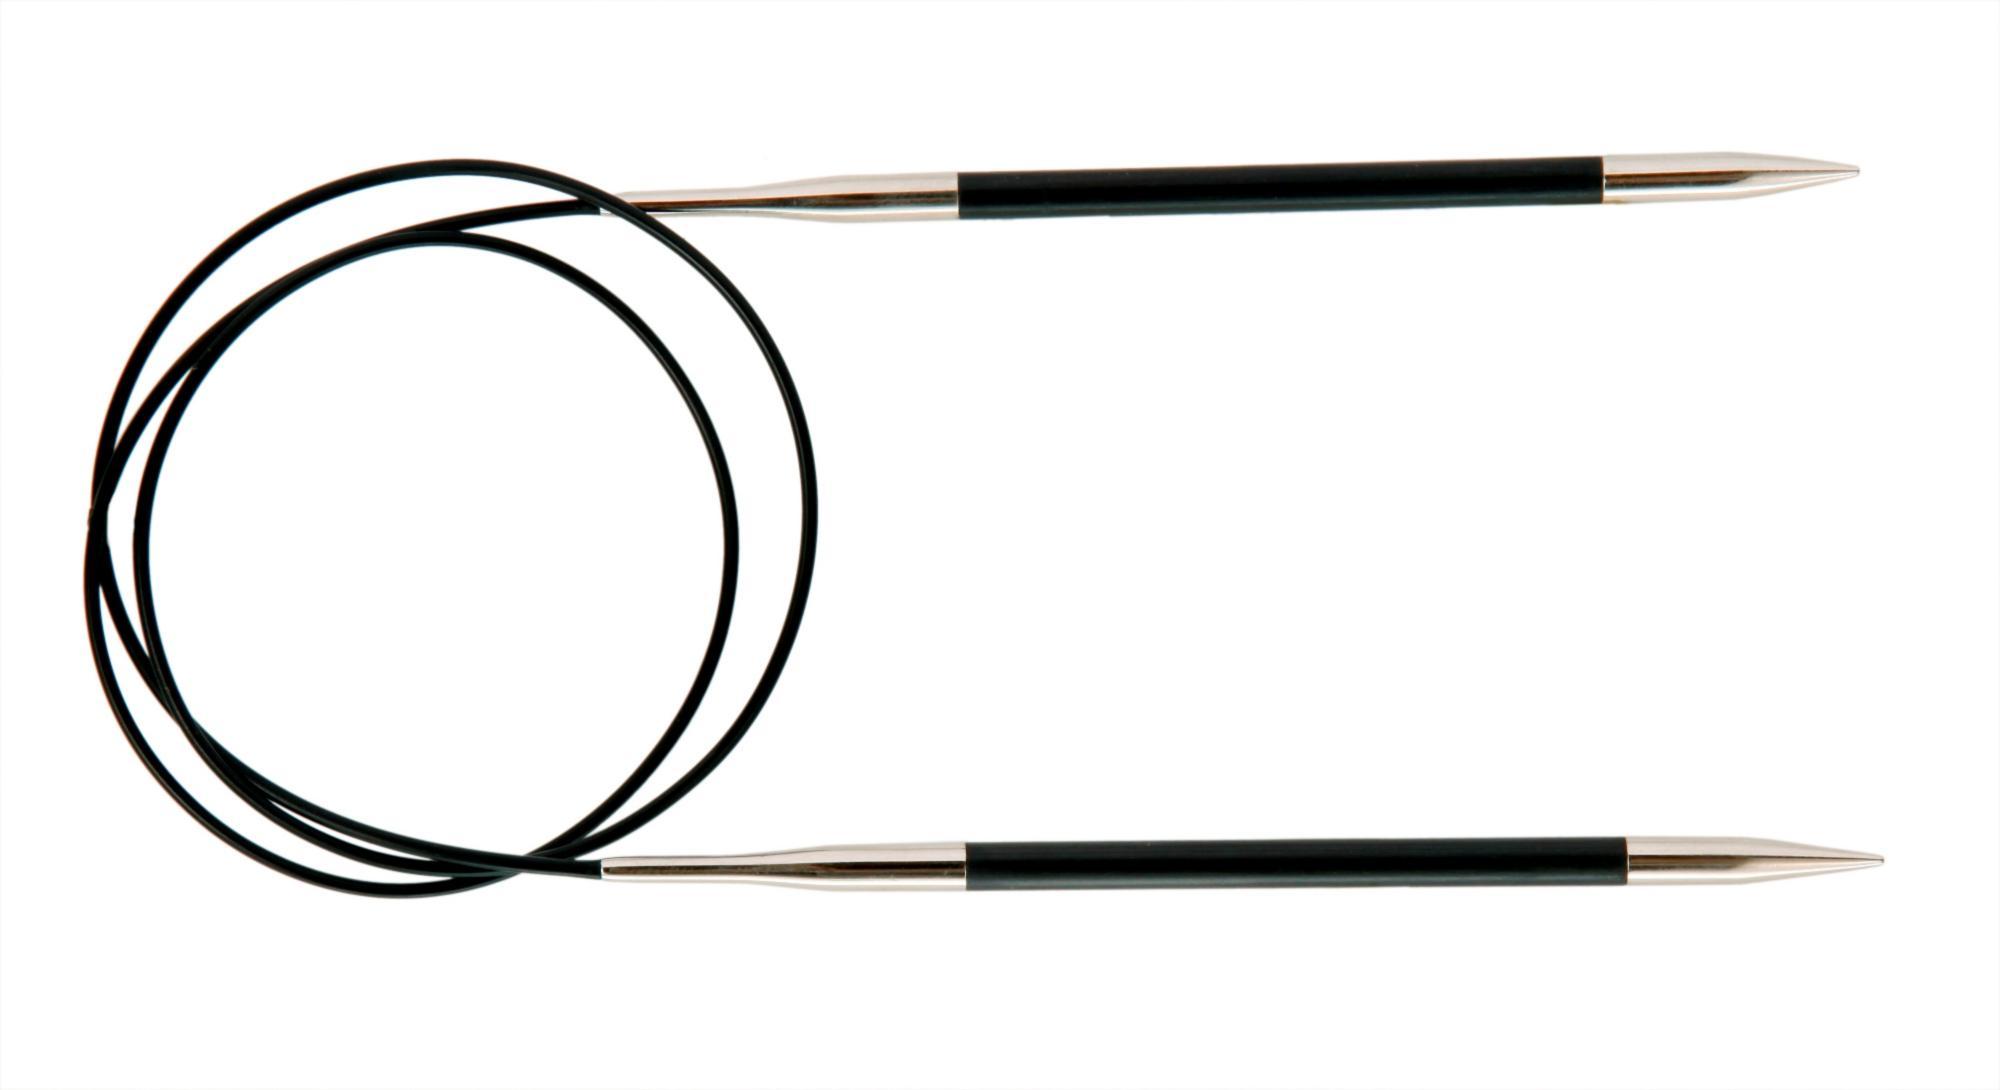 Спицы круговые 60 см Karbonz KnitPro, 41169, 4.50 мм